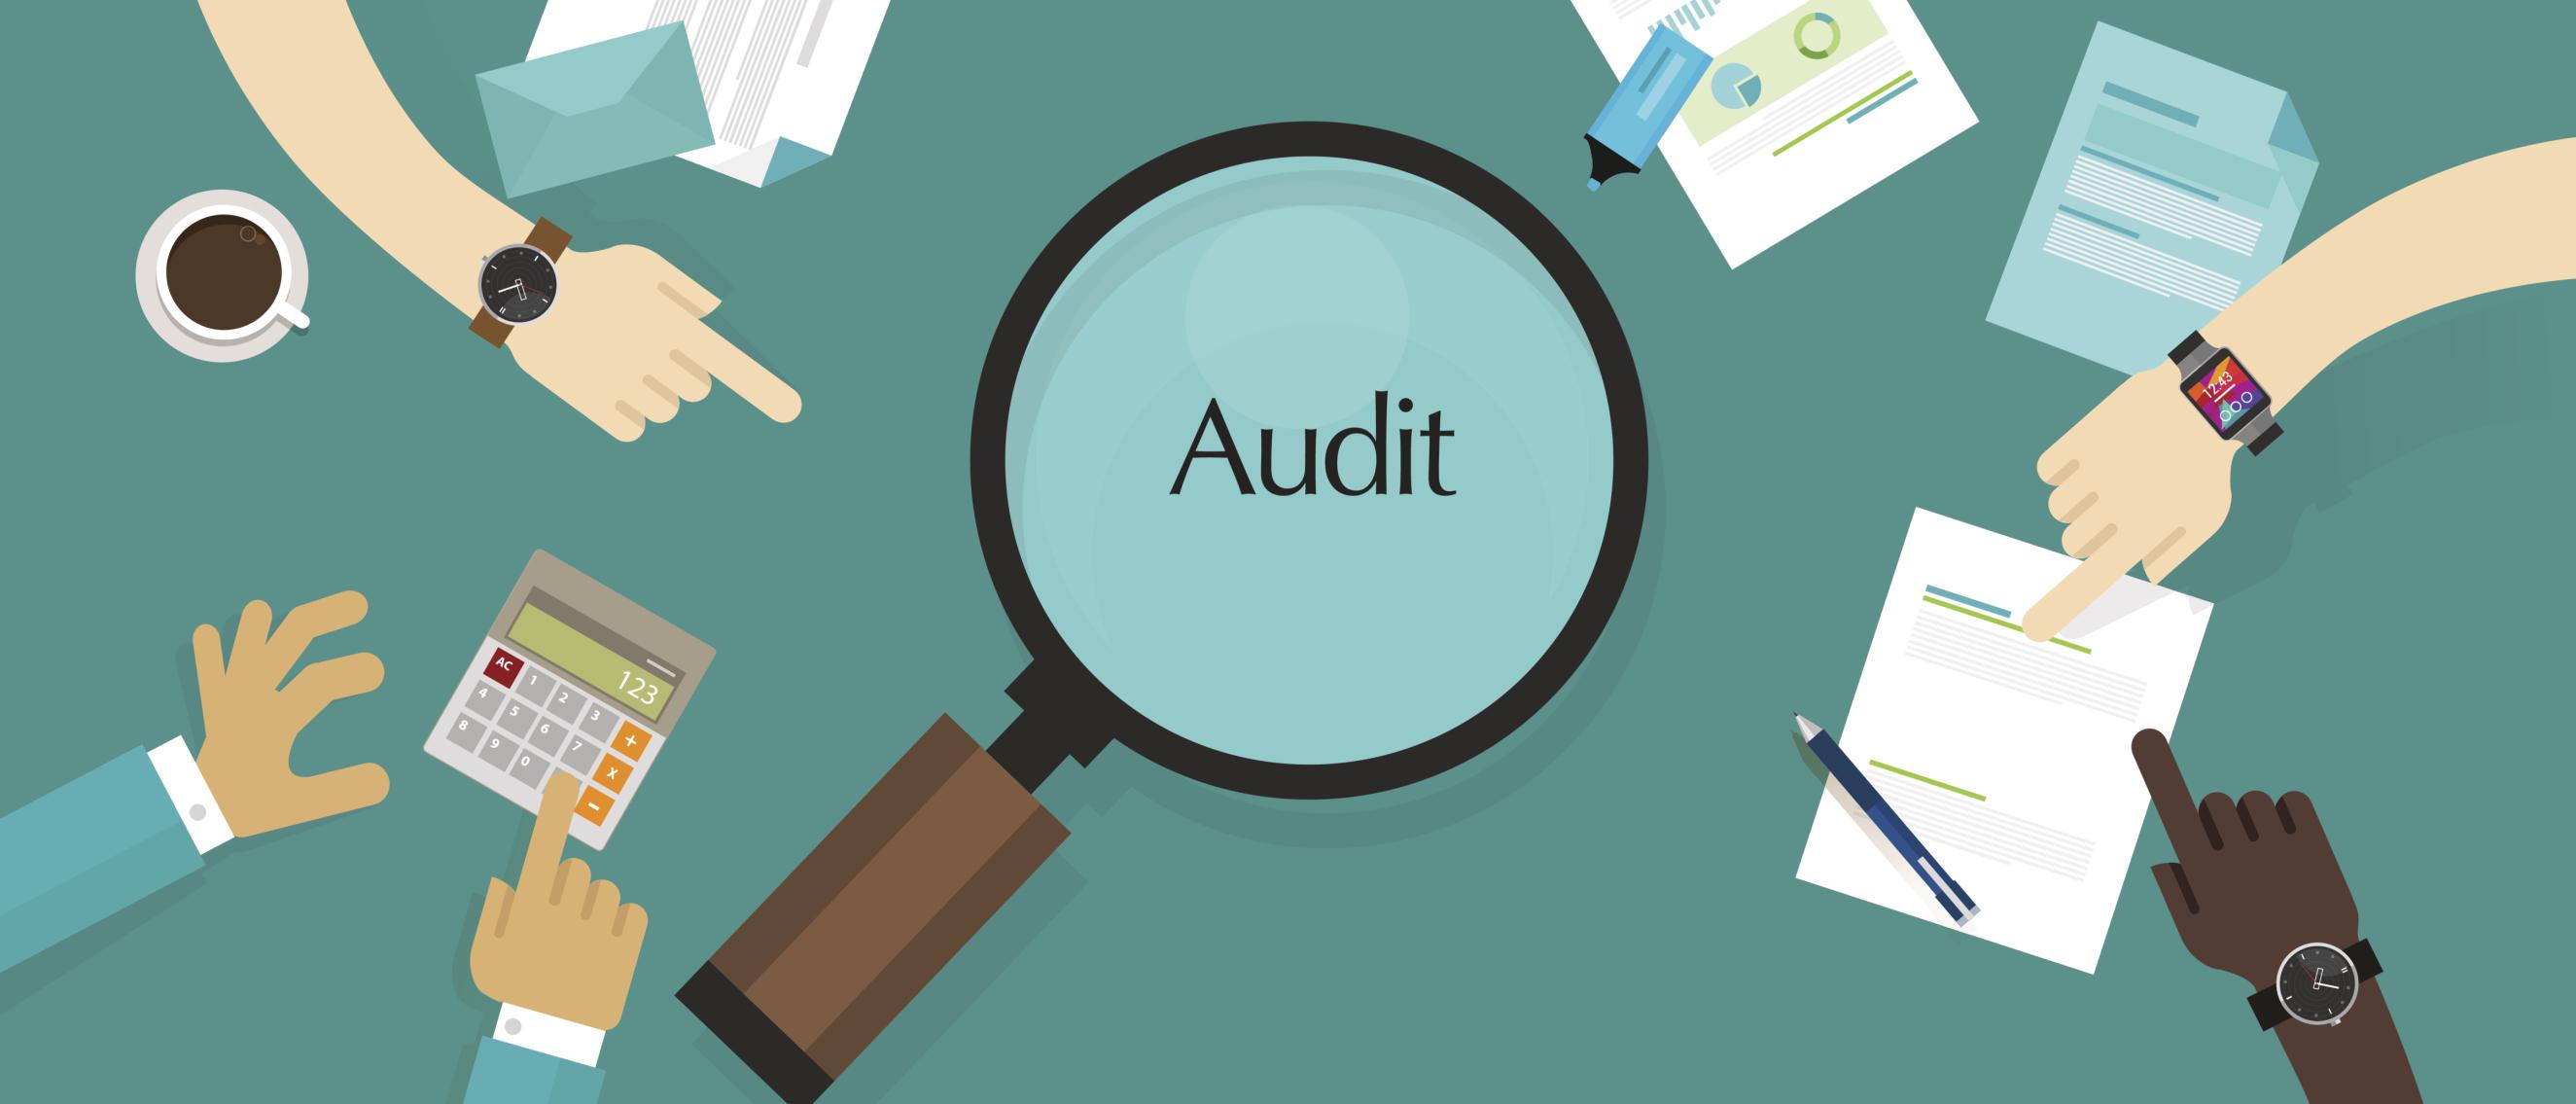 Pelatihan Strategi Menghadapi Audit Kepabeanan, Keberatan dan Banding